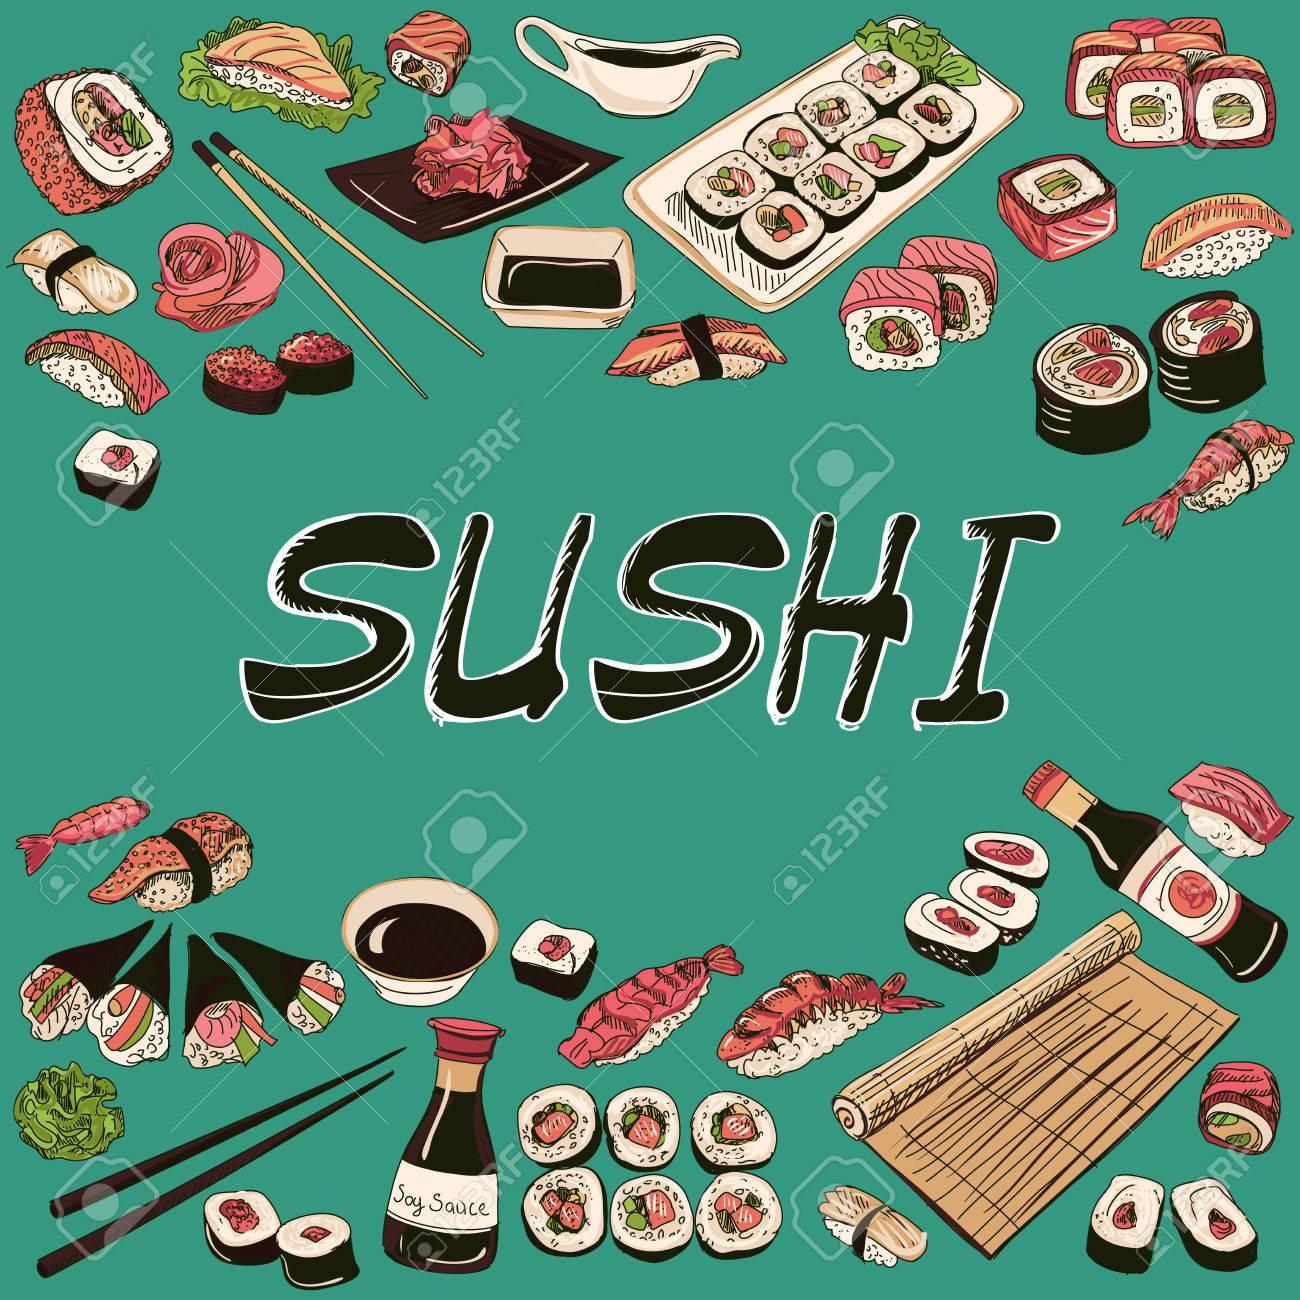 Sushi illustration. Hand drawn style, excellent illustration - 42497402